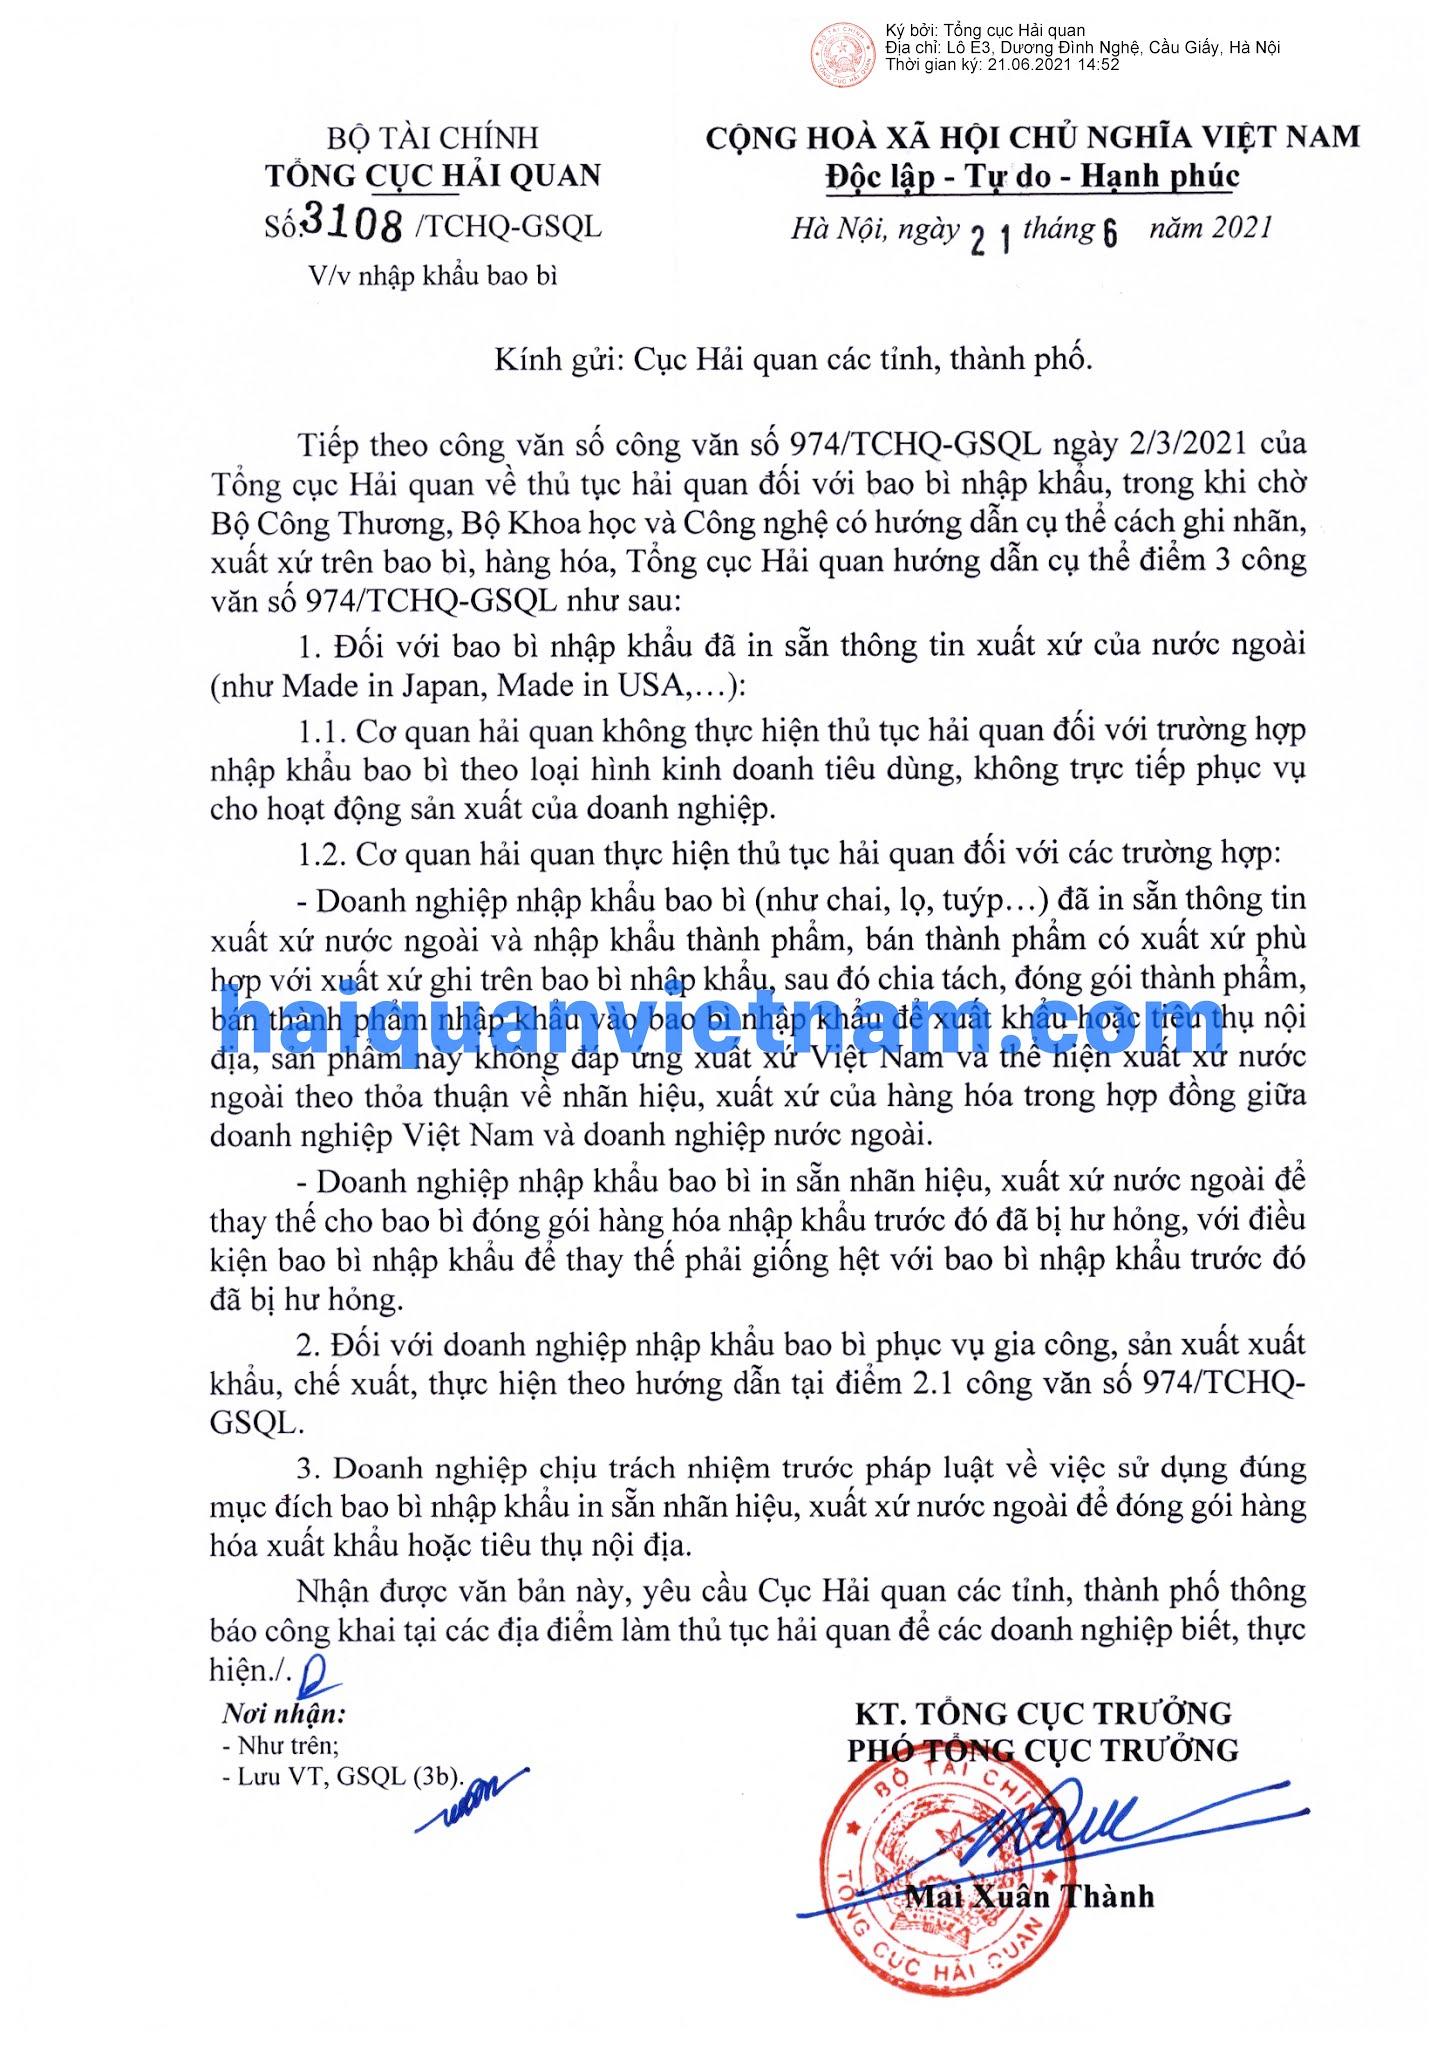 [Image: 210621_3108_TCHQ-GSQL_haiquanvietnam_01.jpg]